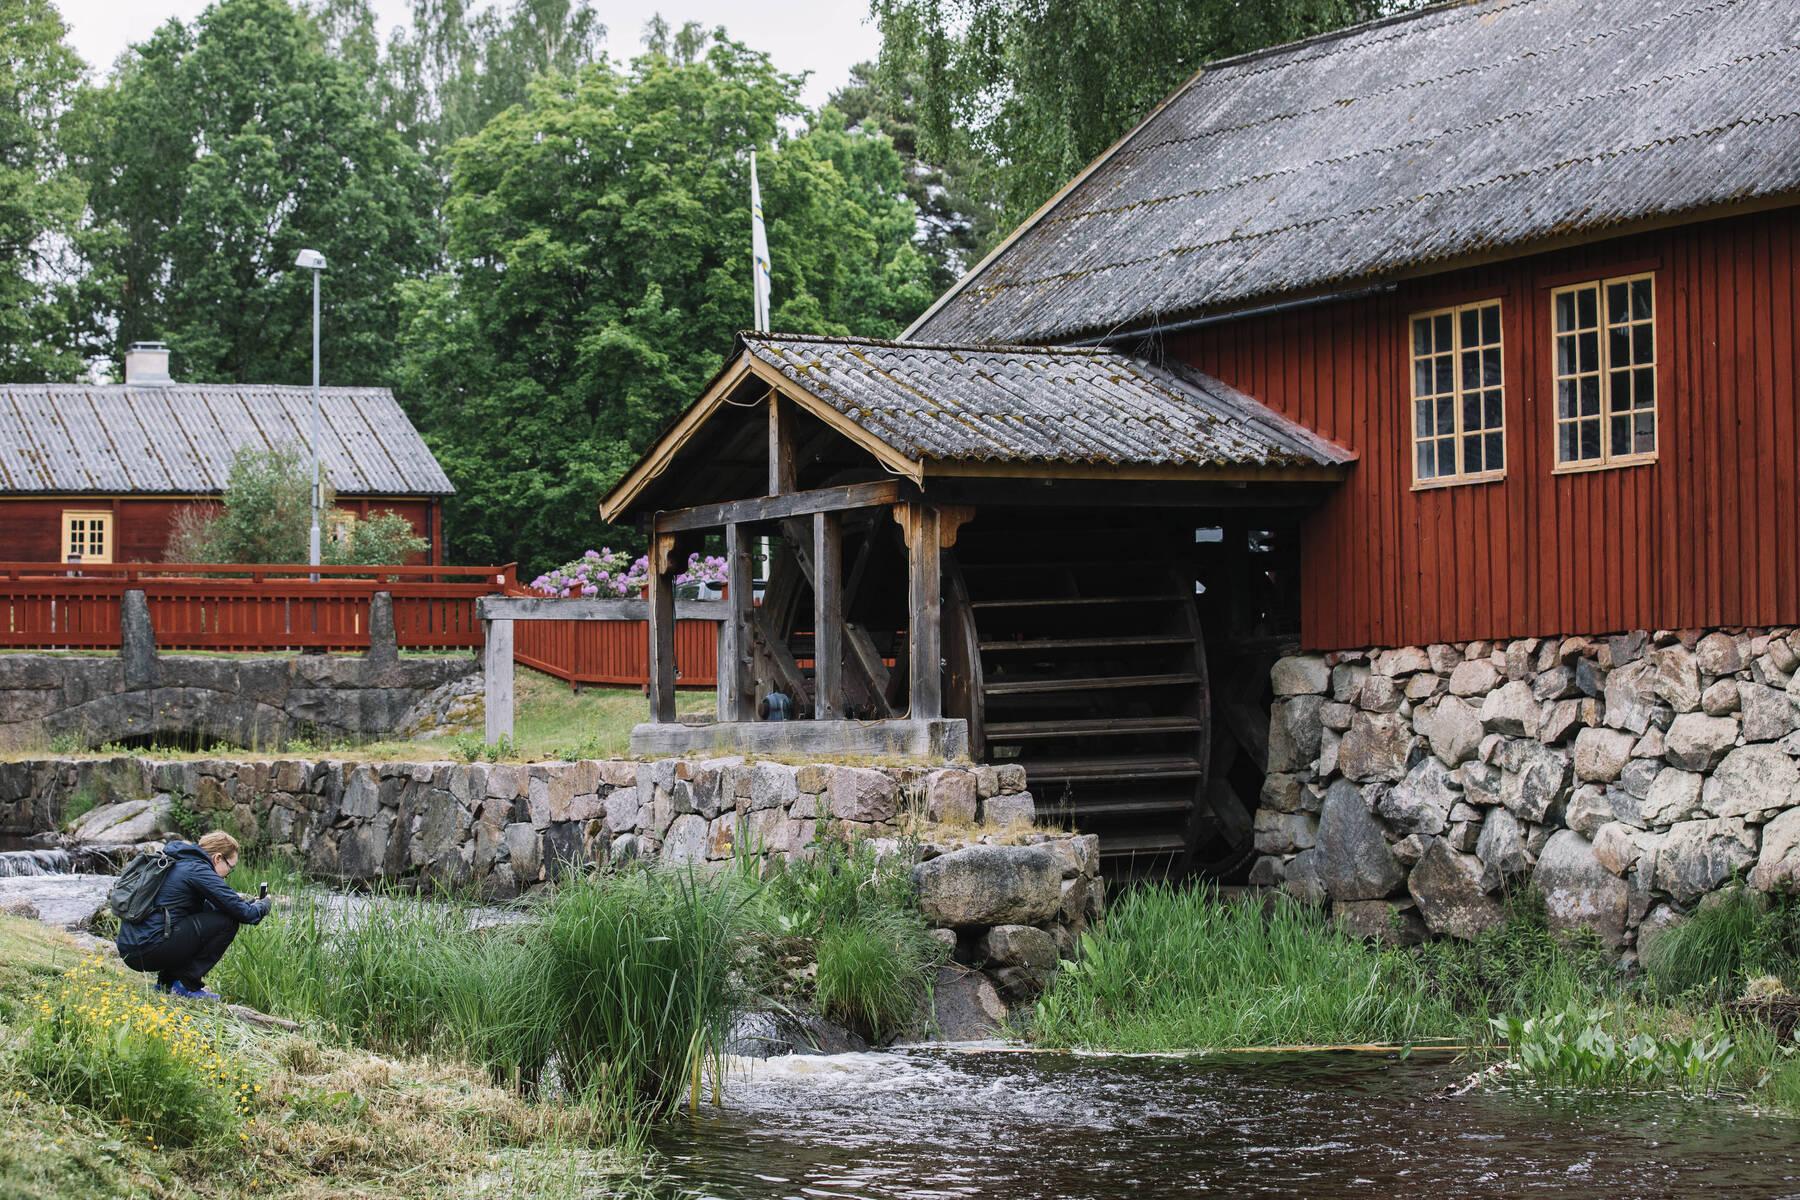 Korrö Hantverksby